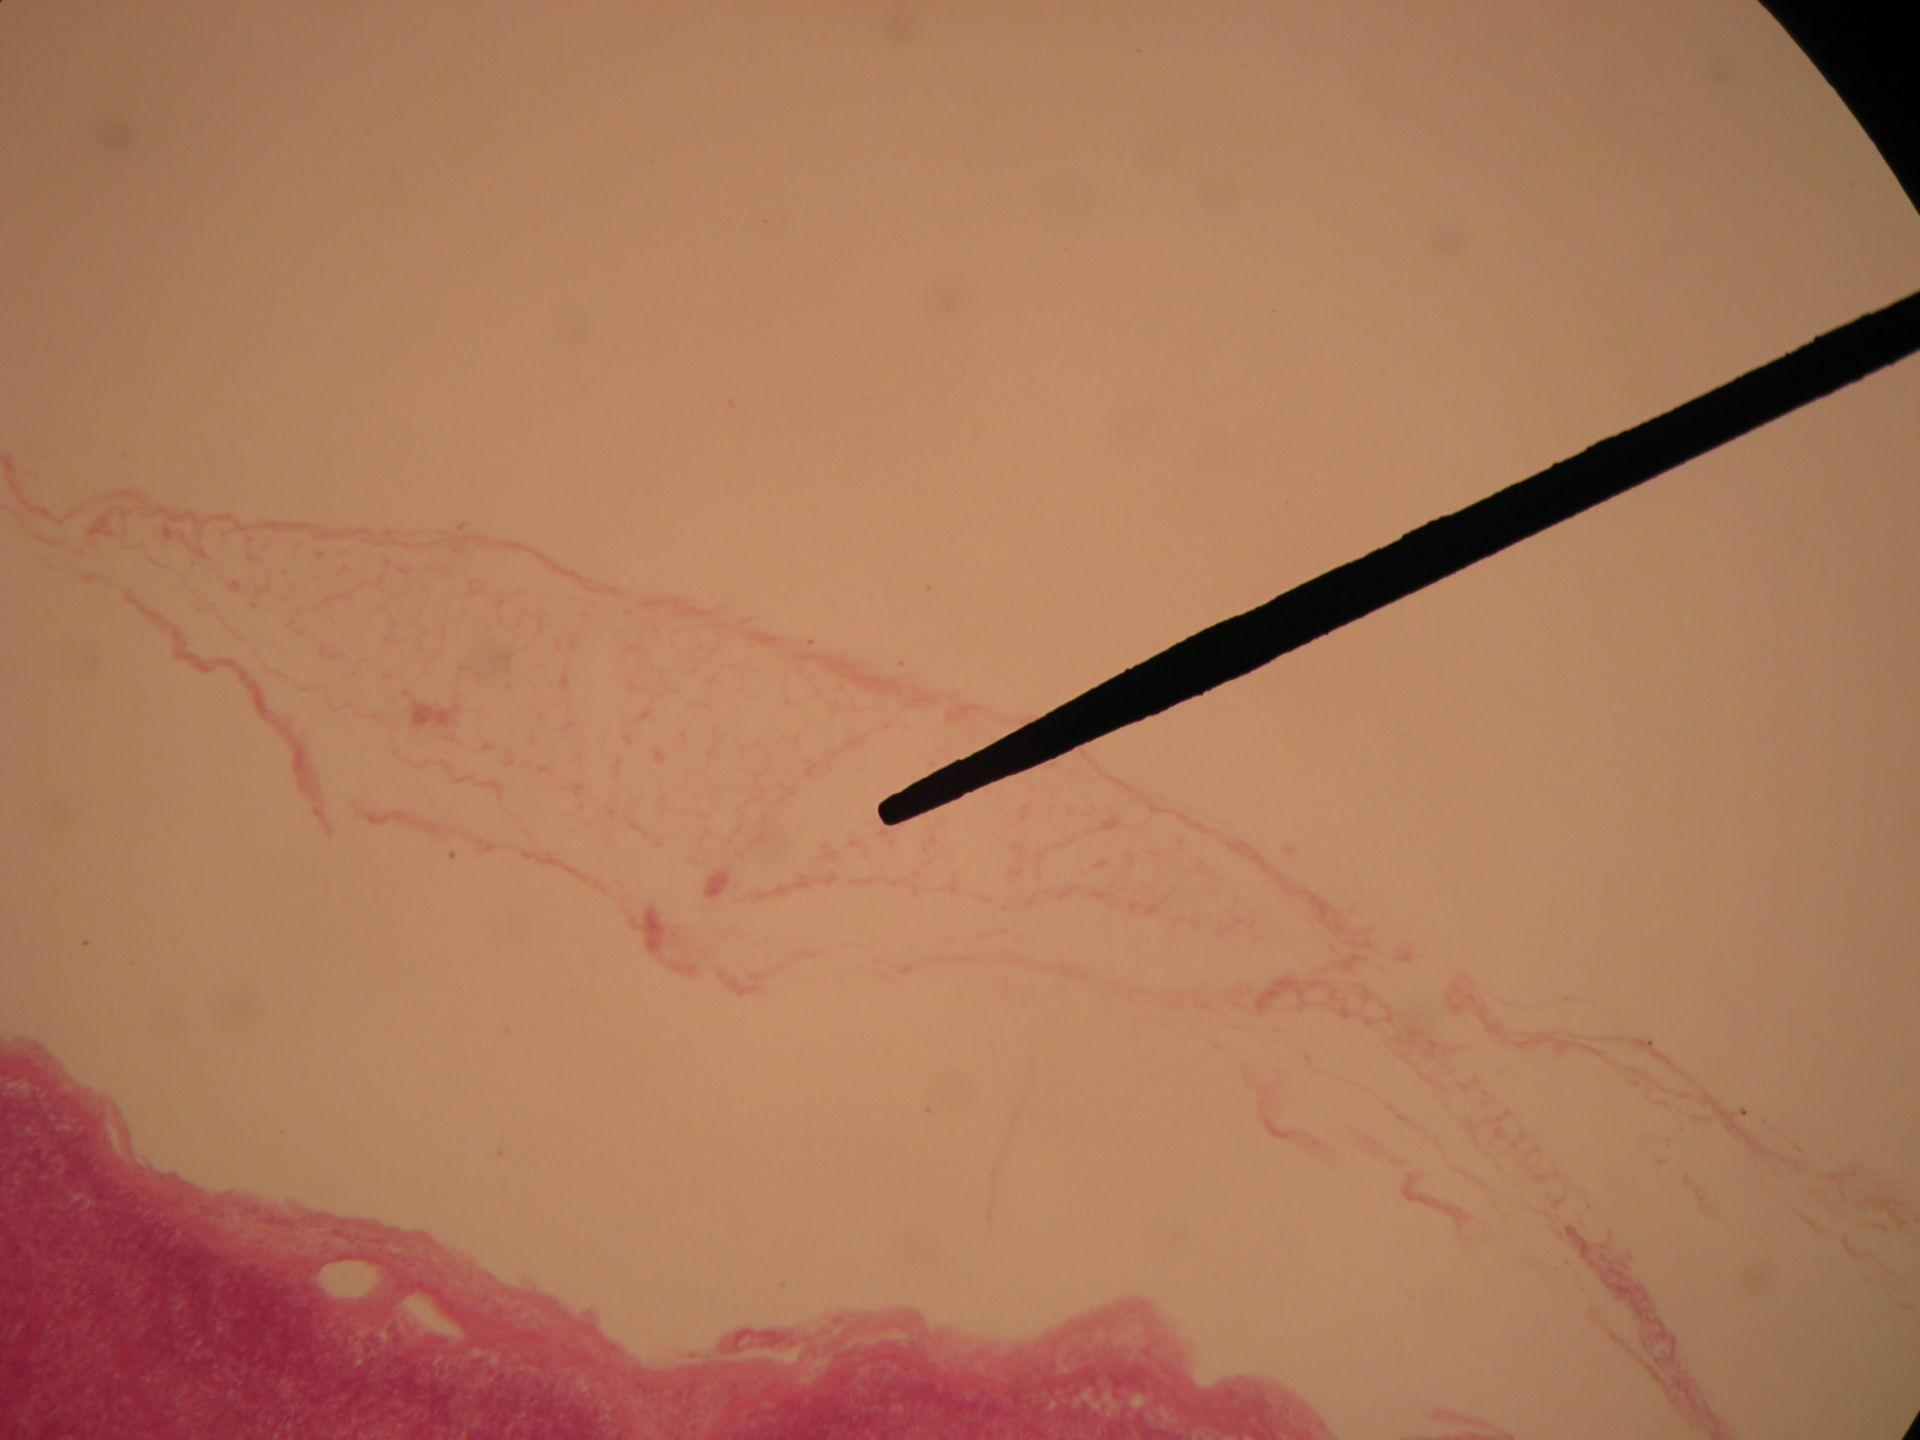 Bovine Lymph Node (4)- Fatty Tissue on the Capsule